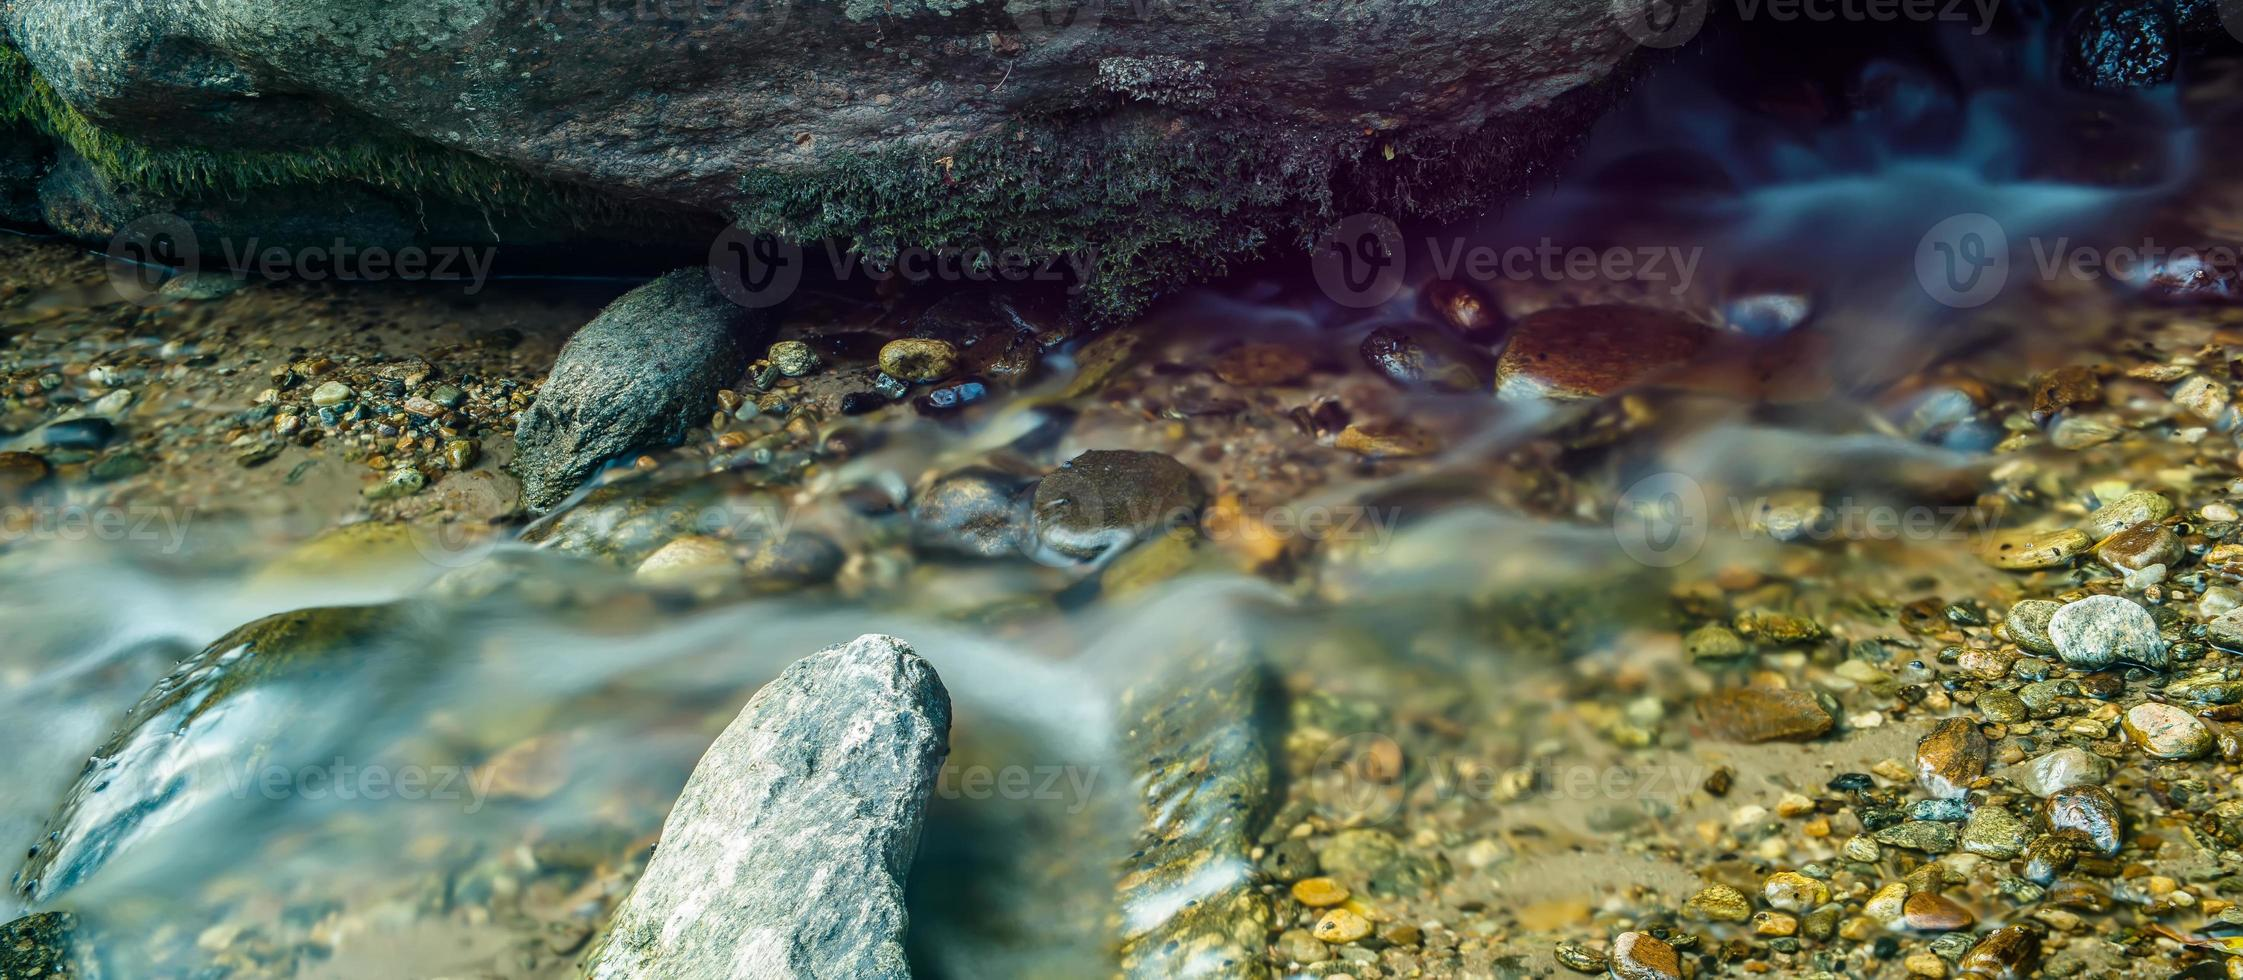 bred flod som rinner genom skogsbevuxen skog foto